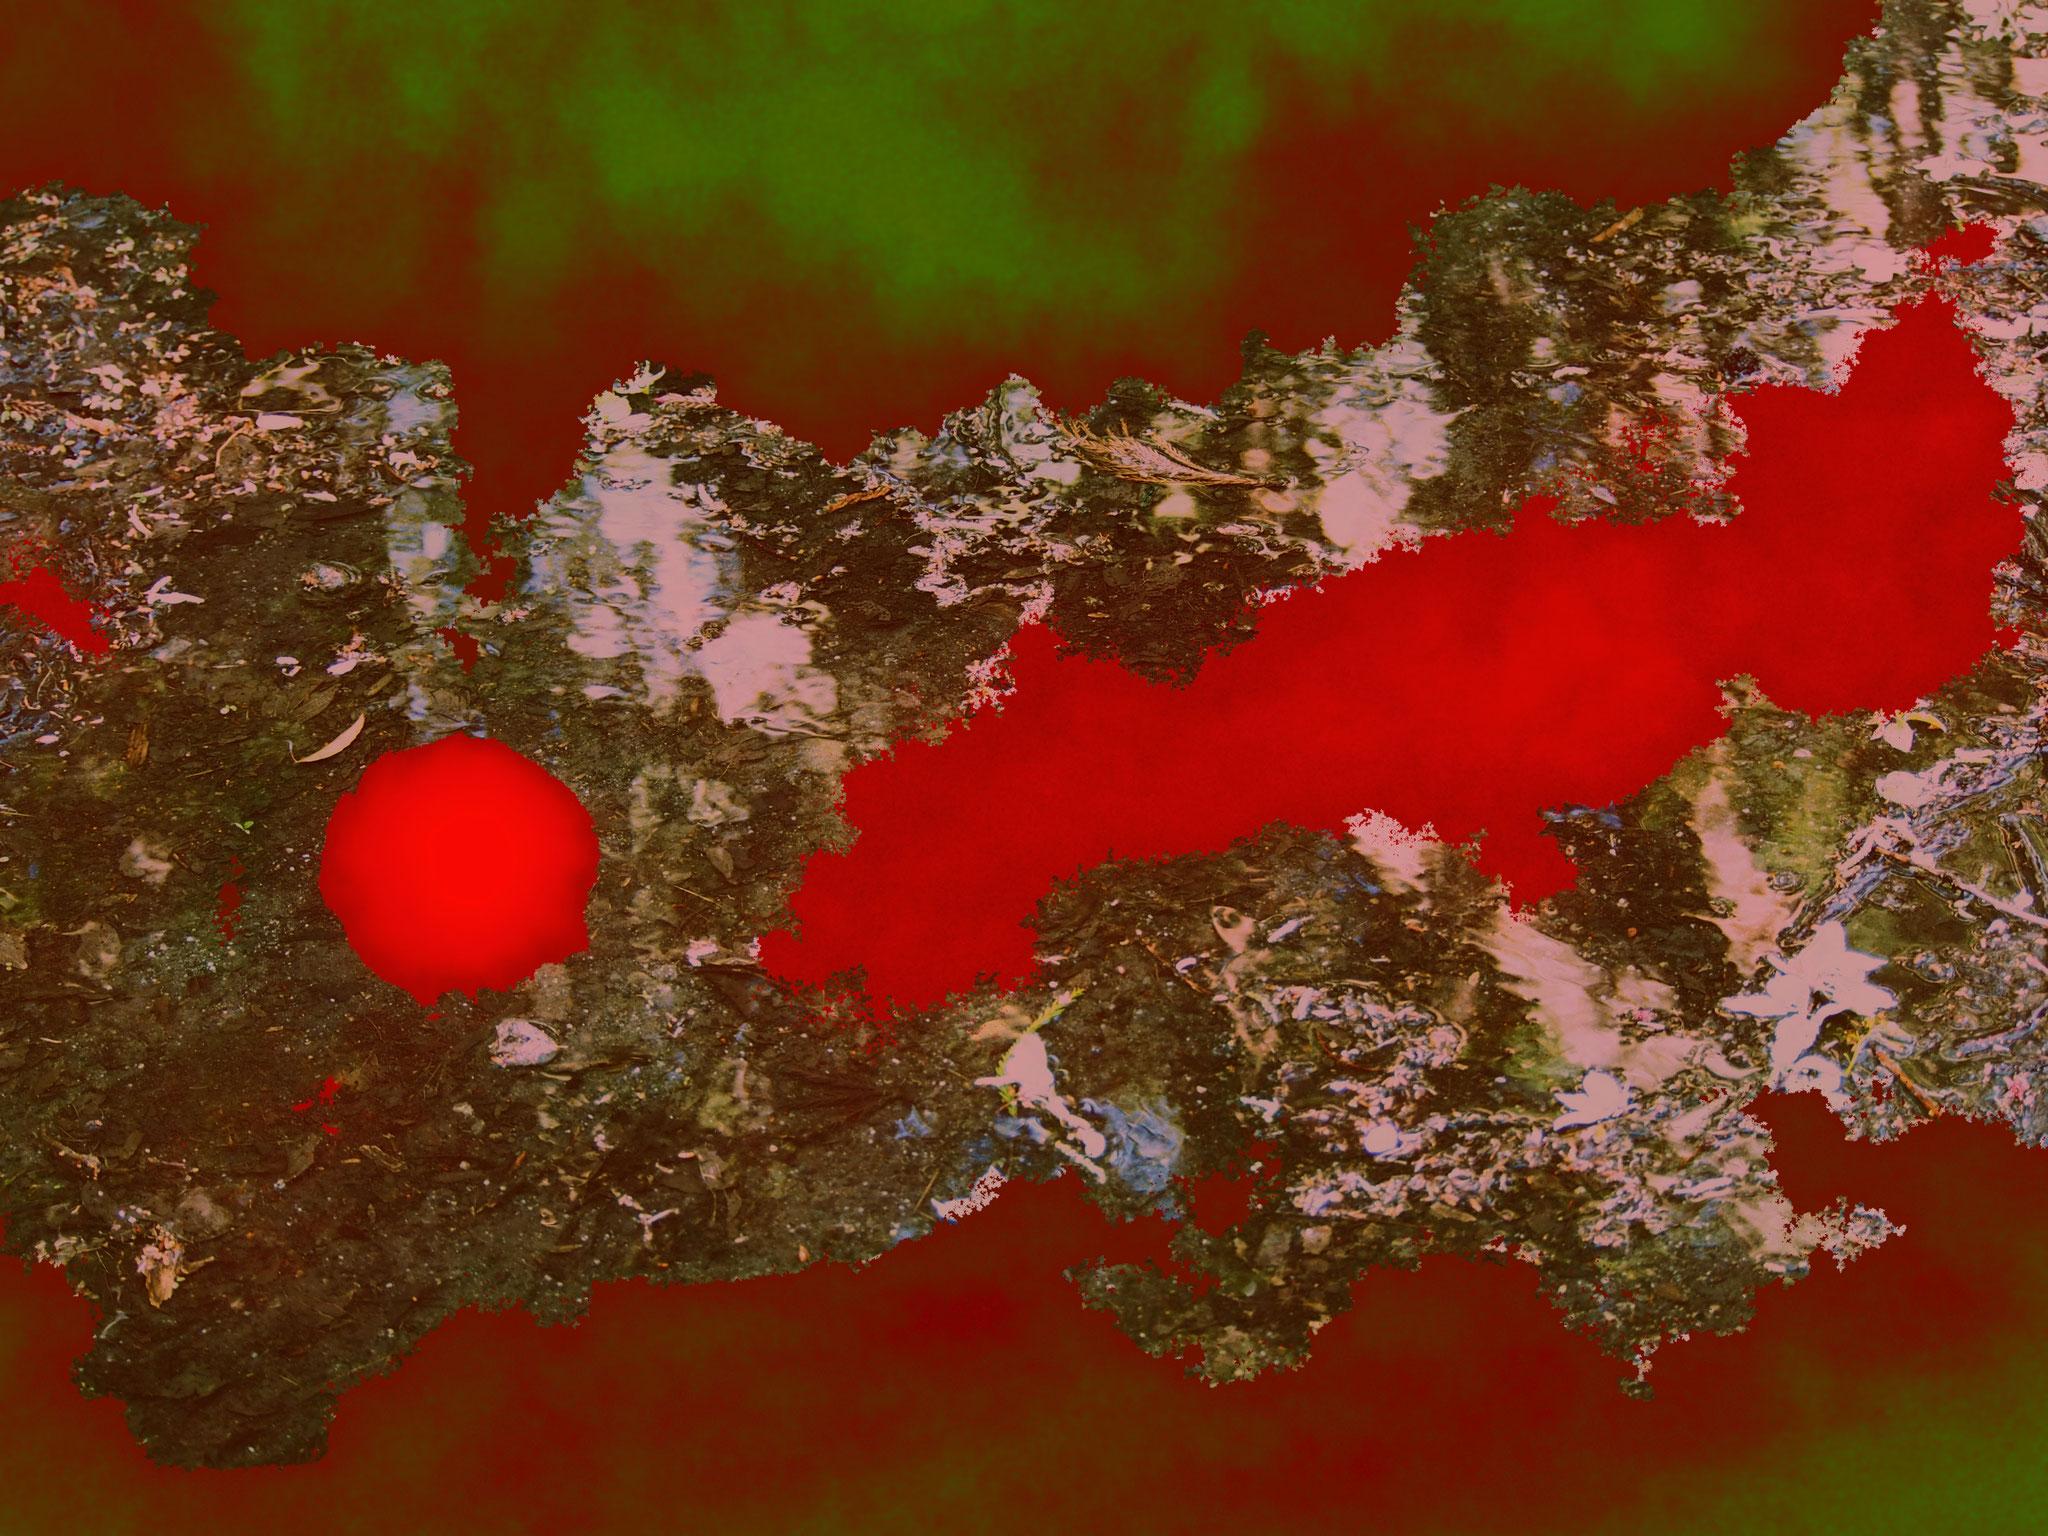 La lune dans le caniveau                                   ©asanuma.brice.cecile